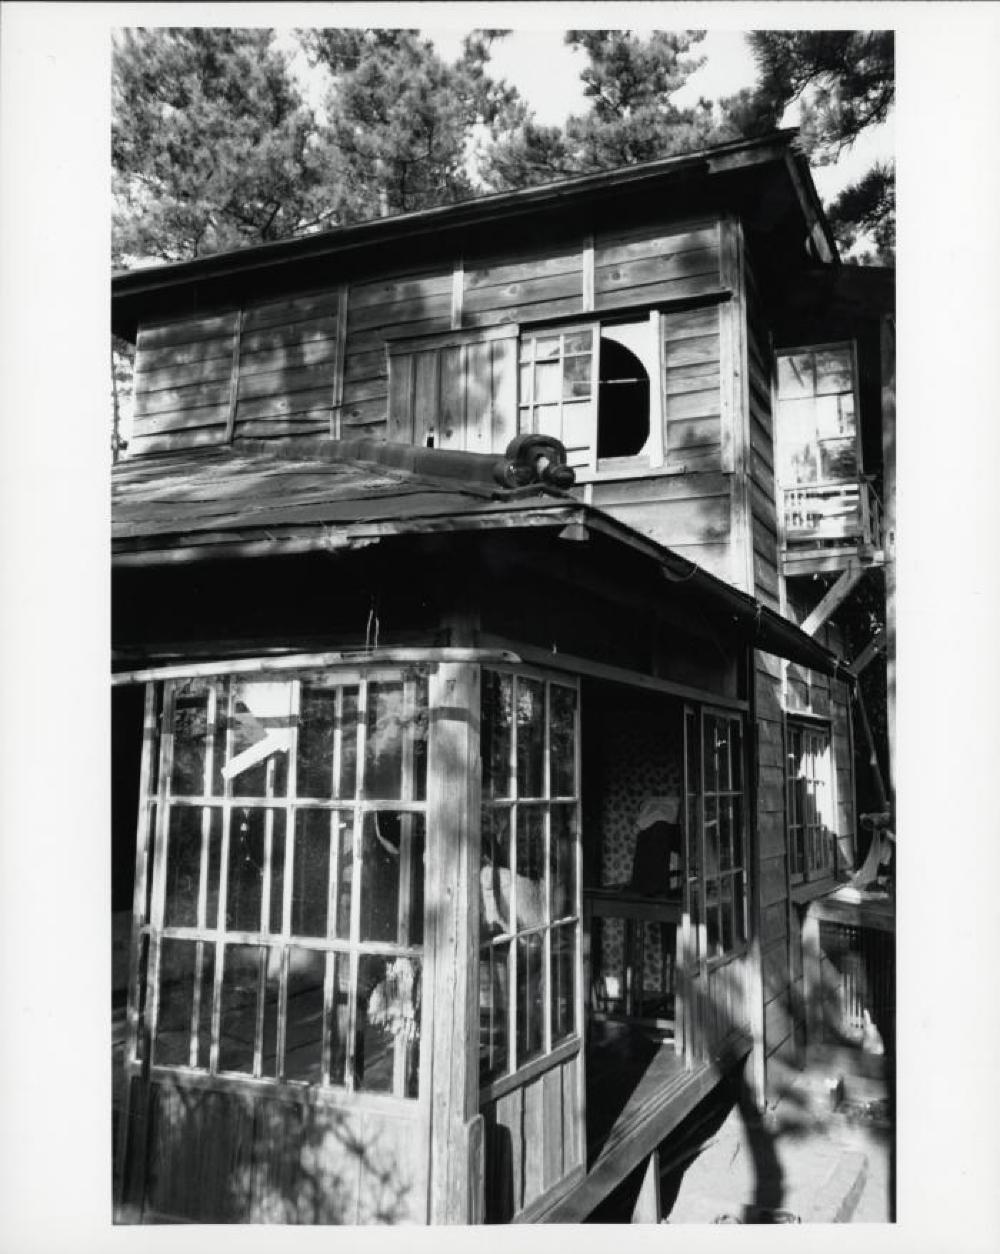 Isamu Noguchi's childhood home in Chigasaki, Japan